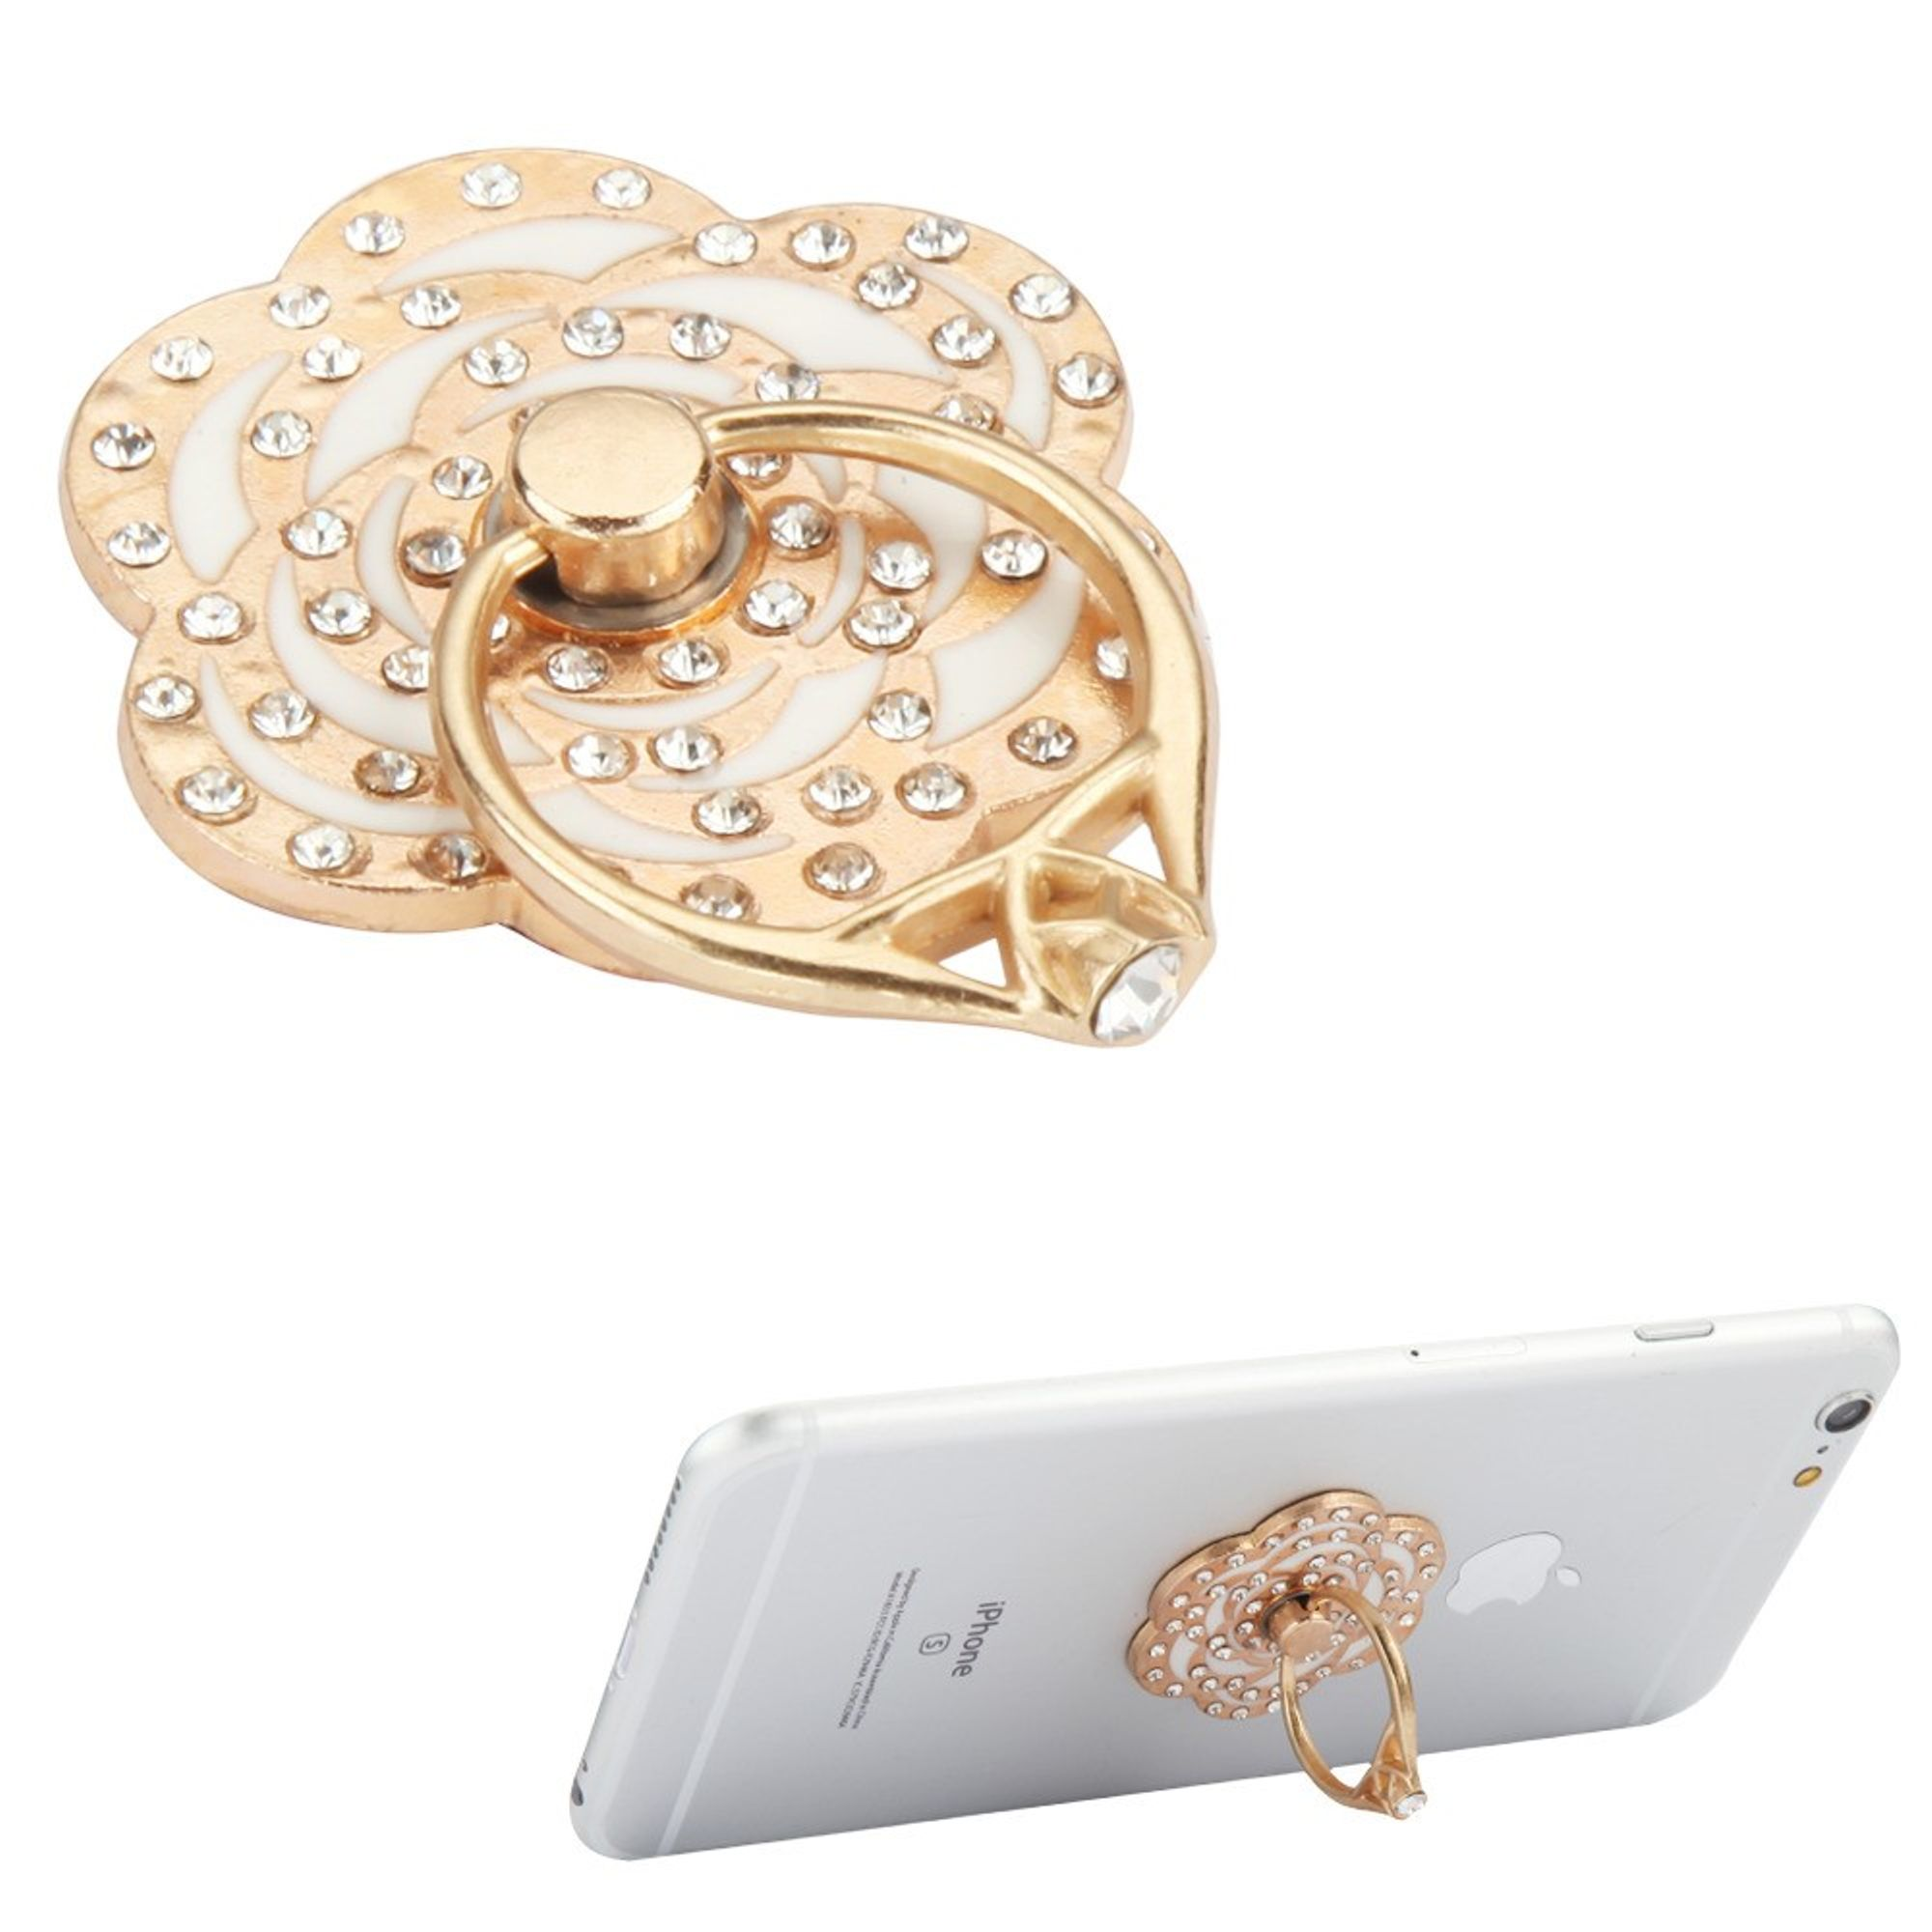 Insten Universal Flower Diamond Finger Grip Rotating Ring Stand Holder for Mobile Phones iPhones Tablets iPads - White